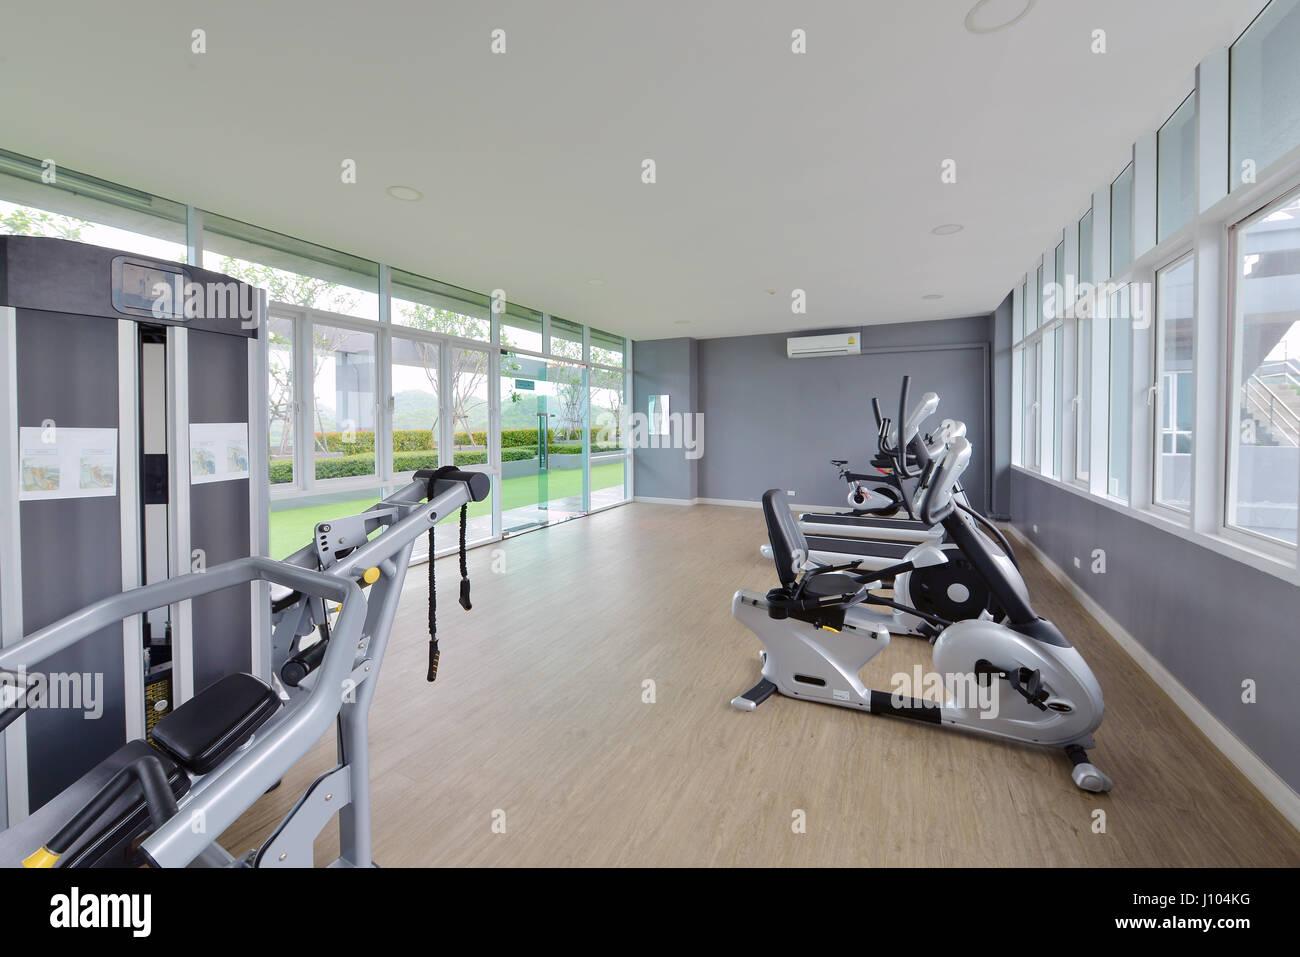 Modern Fitness Center Interior Design Luxury Gym Stock Photo Royalty Free Image 138301284 Alamy